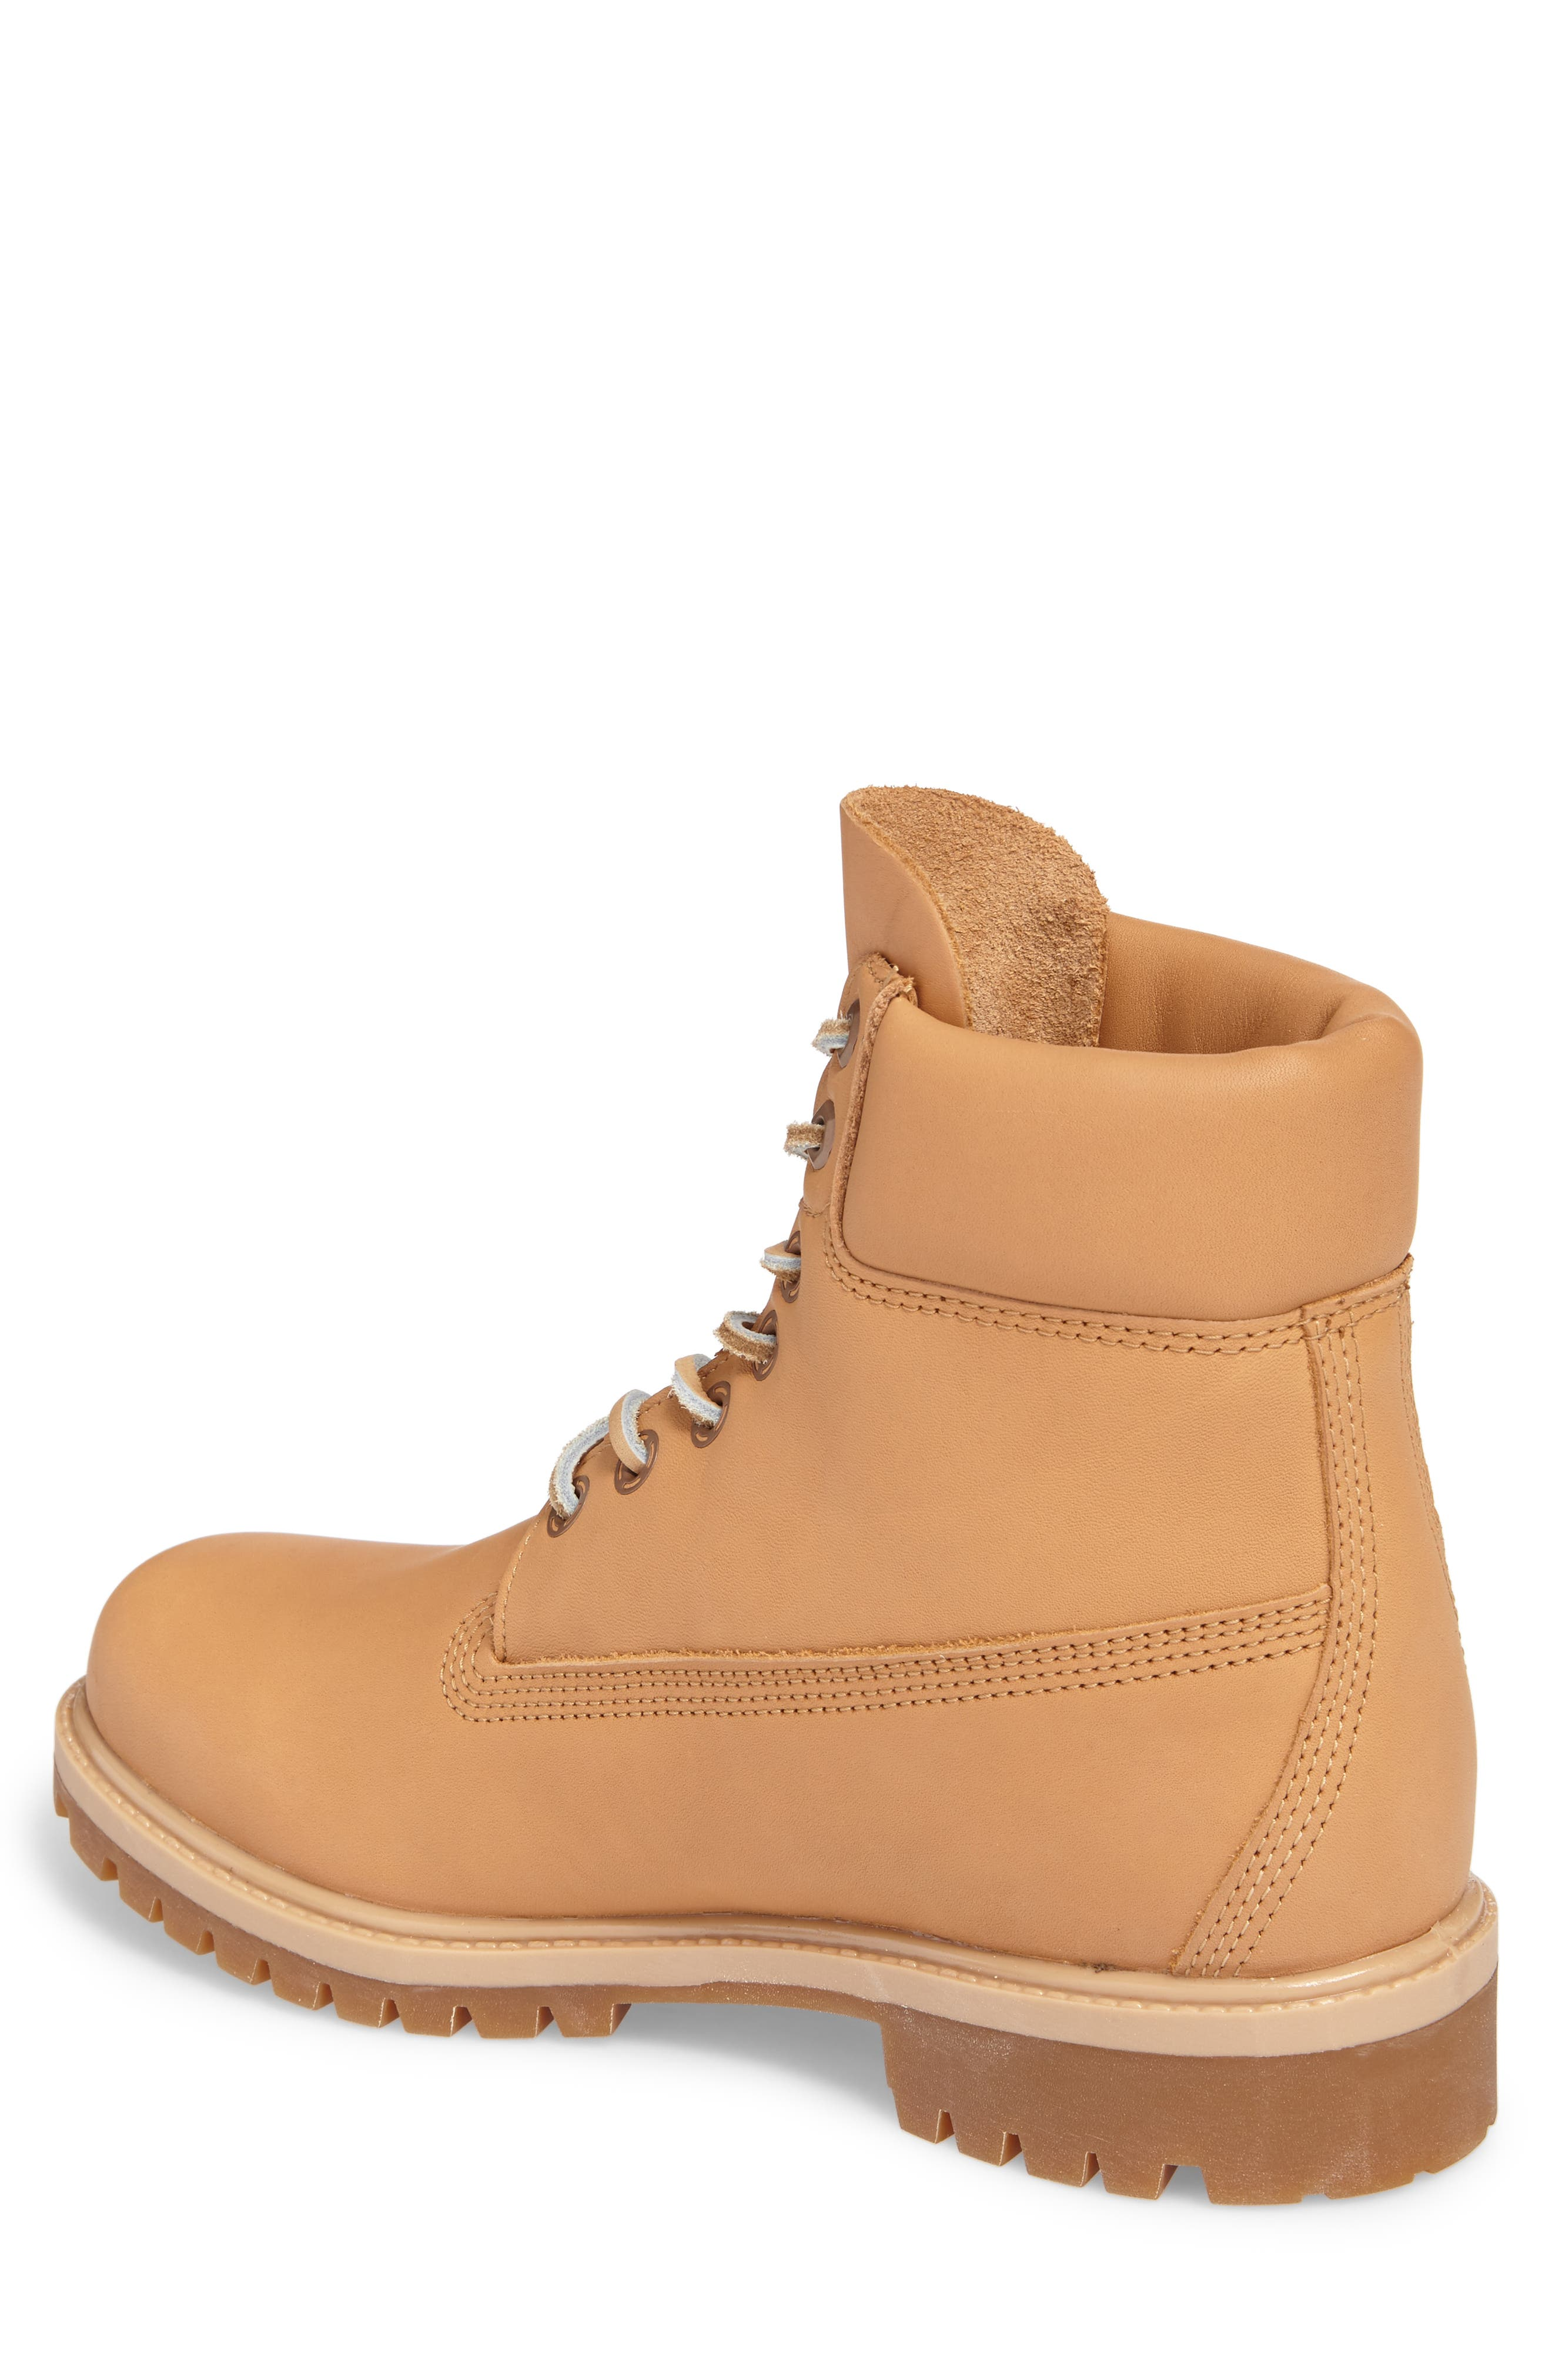 Premium Waterproof Plain Toe Boot,                             Alternate thumbnail 2, color,                             Natural Leather